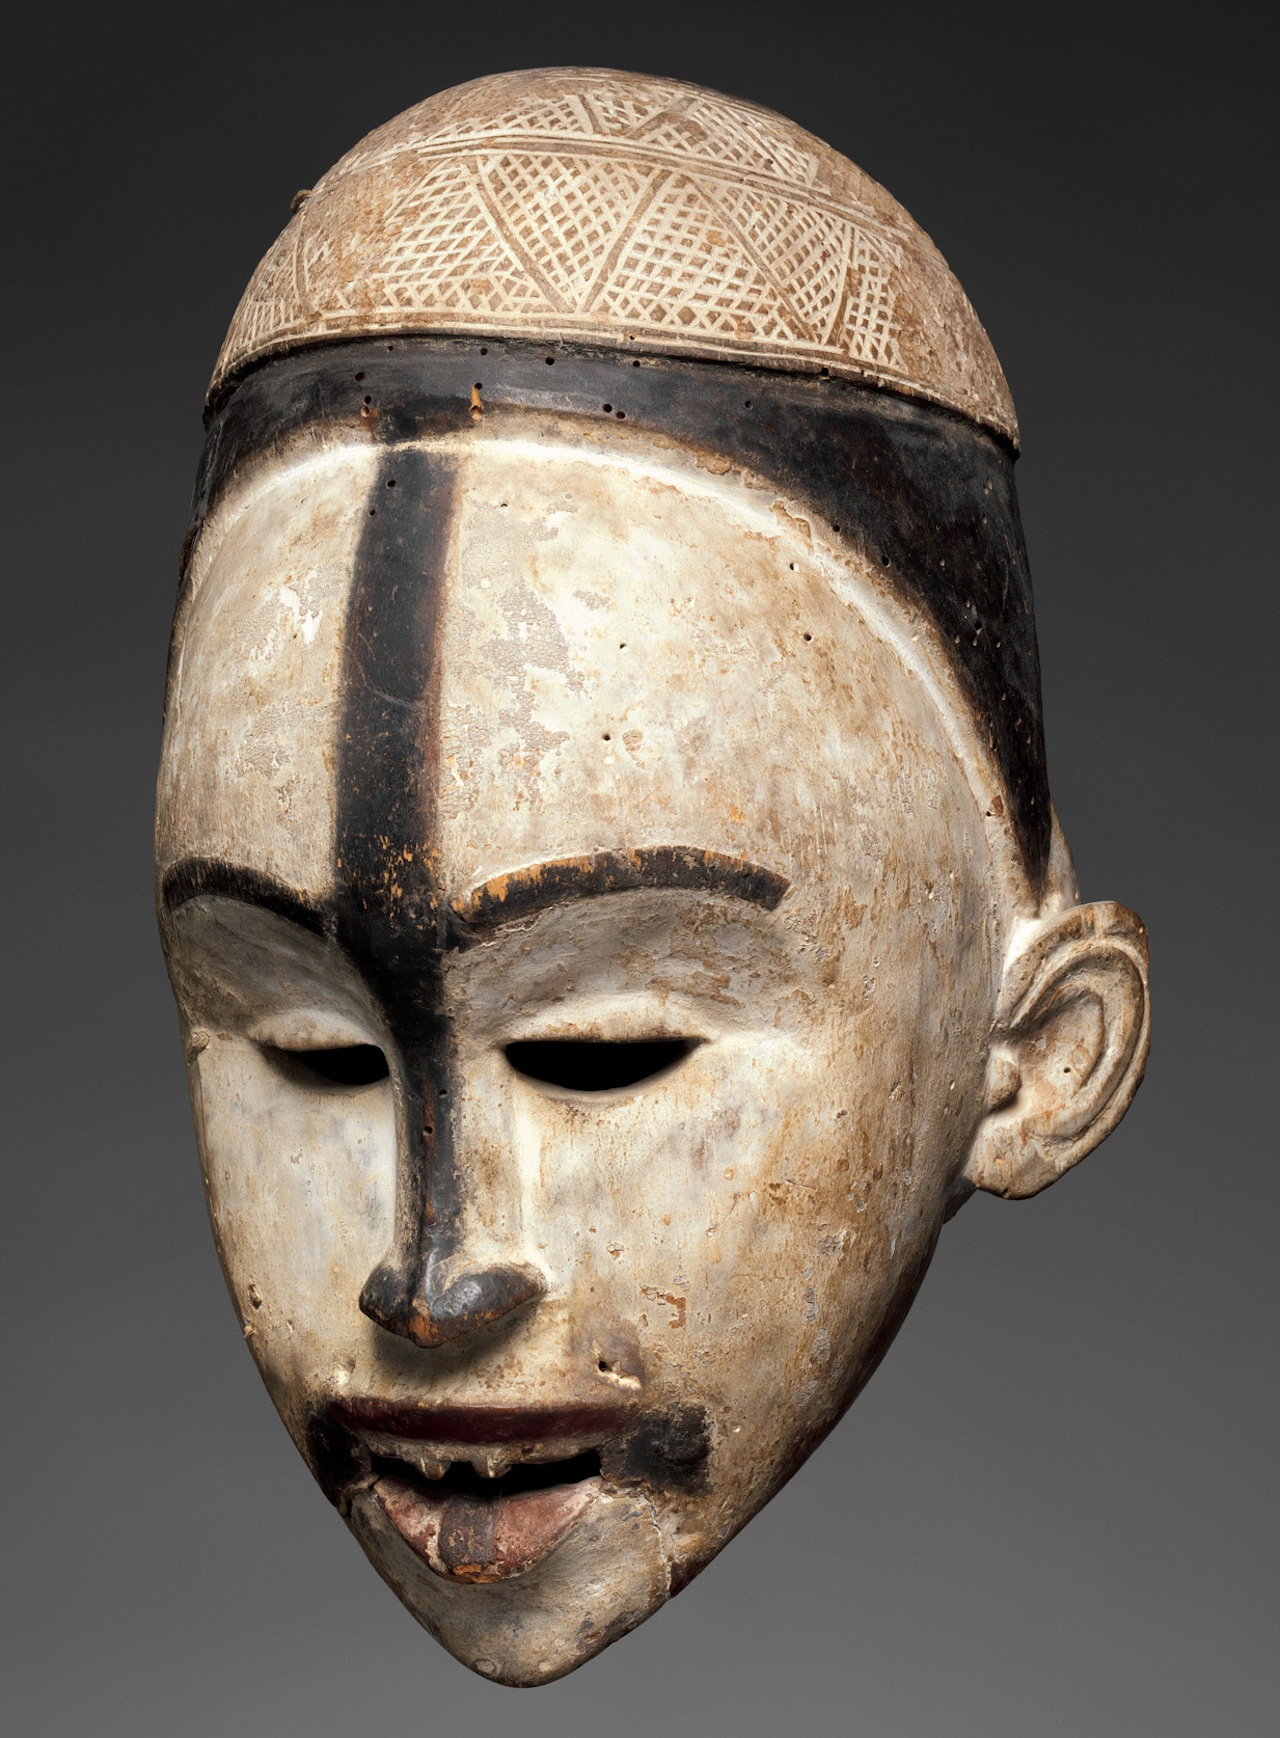 Mask, Kongo peoples, Yombe group, Democratic Republic of the Congo, Republic of the Congo, or Cabinda, Angola (photo Courtesy of the Metropolitan Museum of Art)